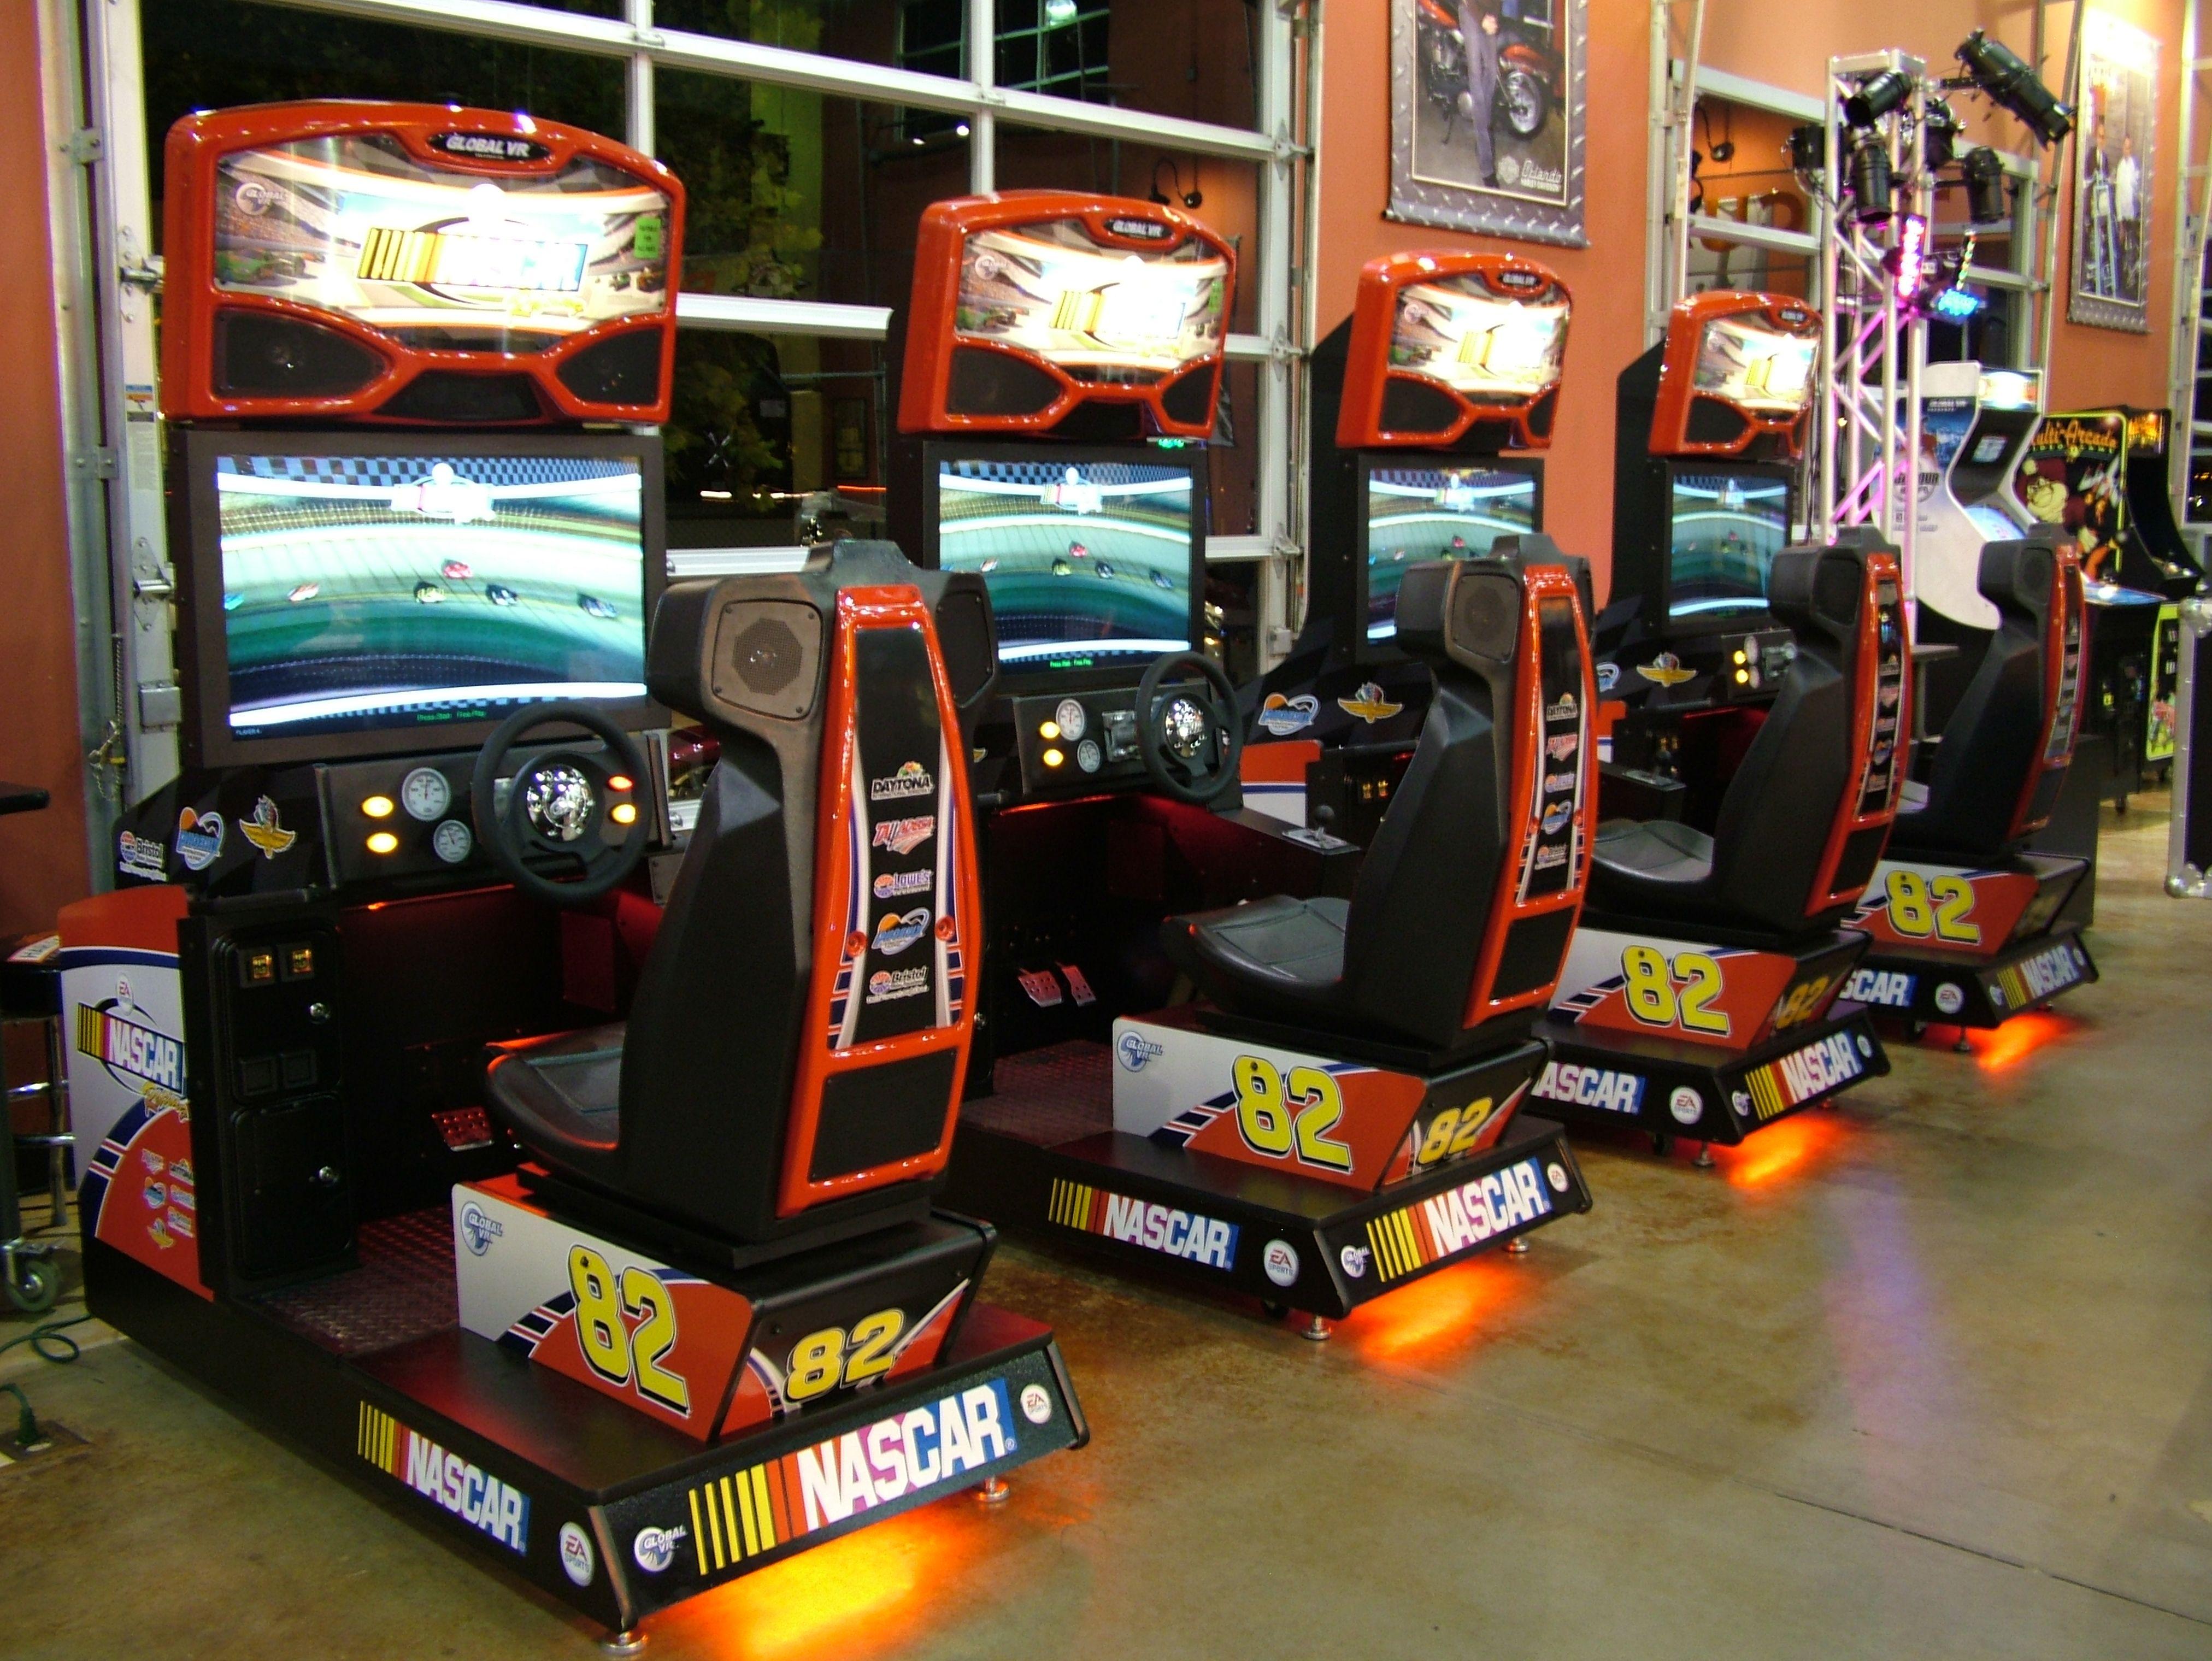 "NASCAR 32"" (With images) Arcade, Interactive game, Nascar"